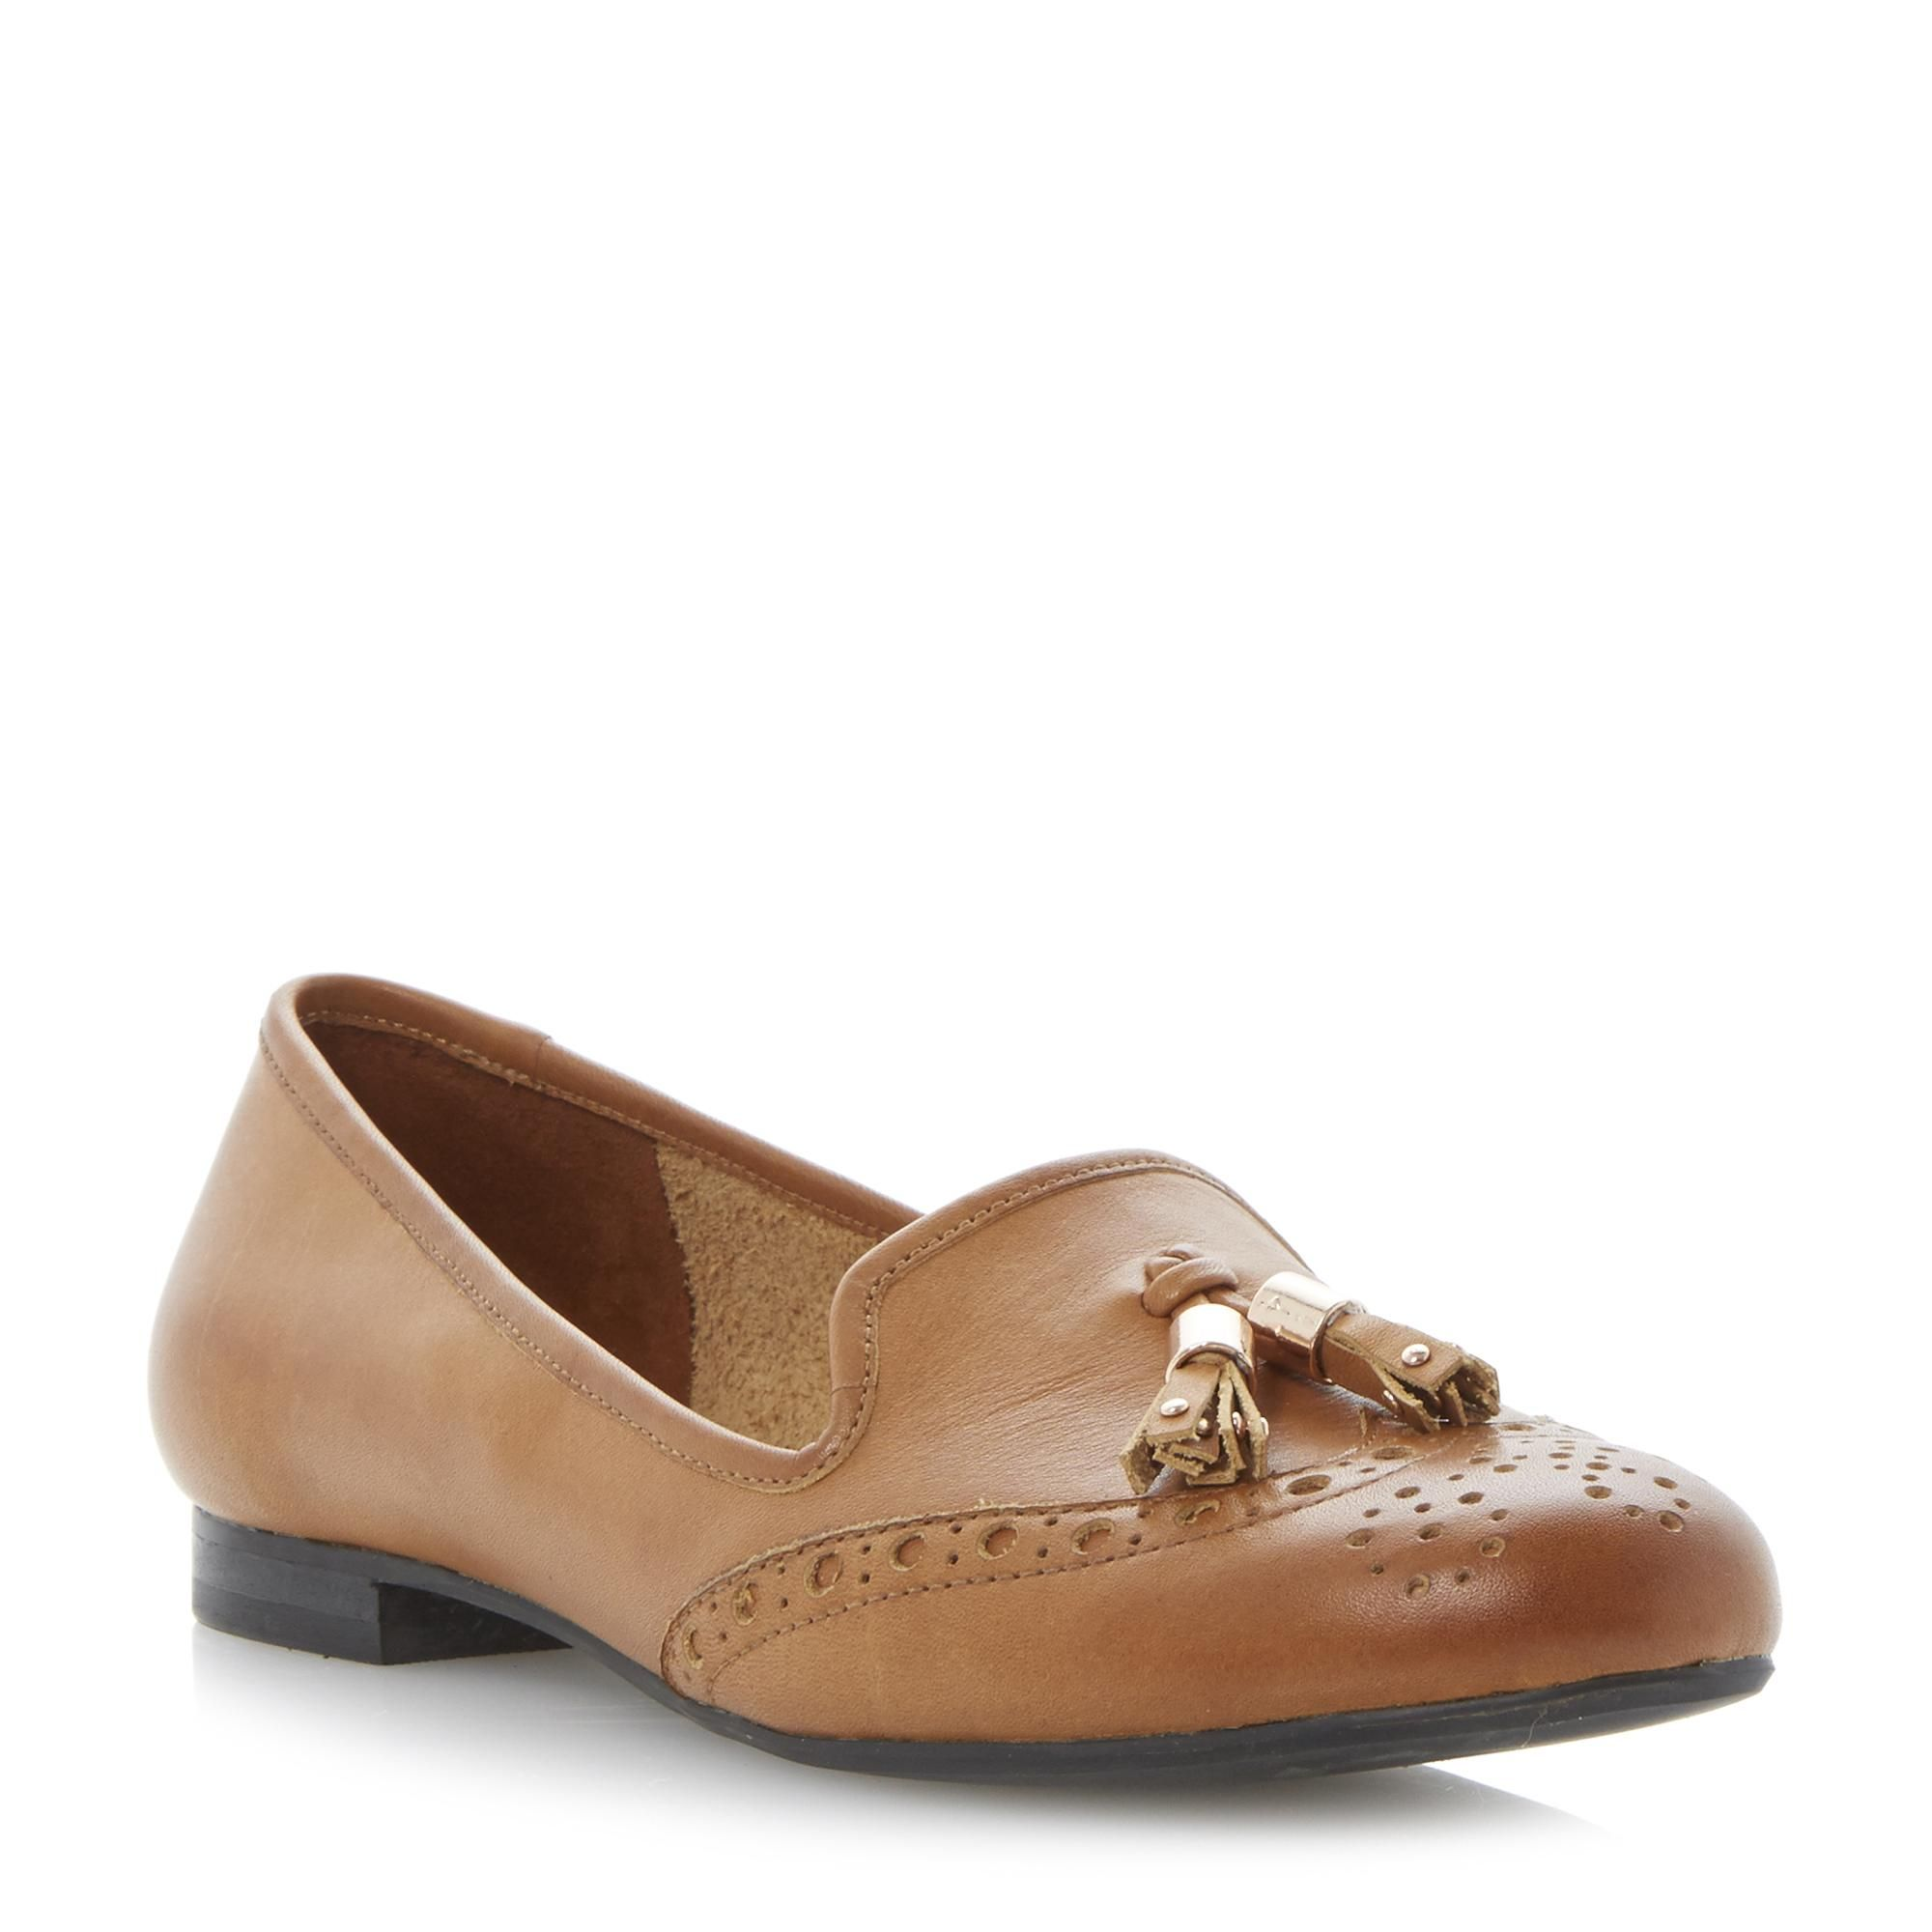 70dd1ed2f43 DUNE LADIES LOKI - Brogue Tassel Detail Loafer Shoe - tan